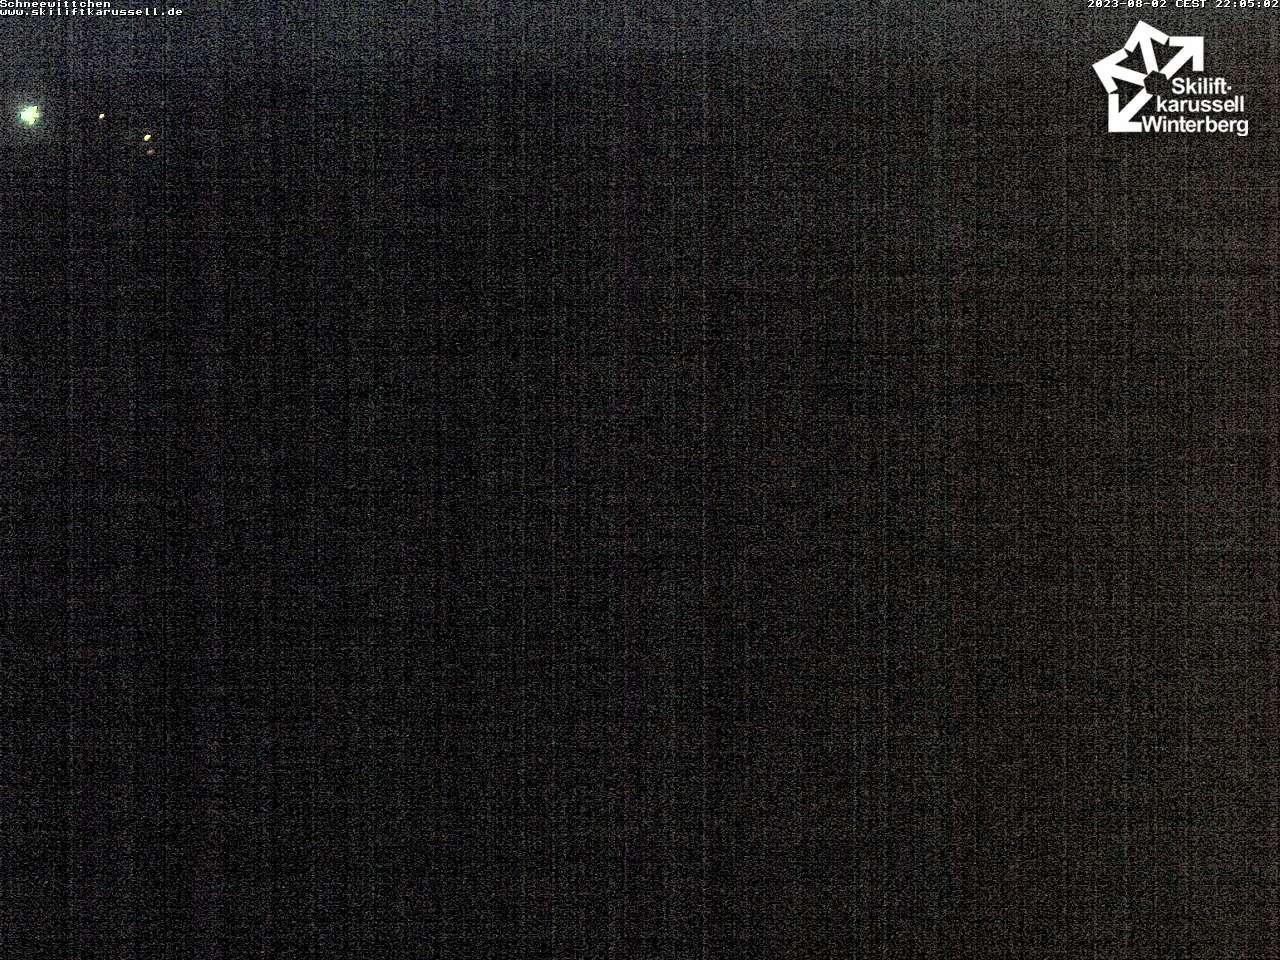 Skiliftkarussell Winterberg - Webcam 12